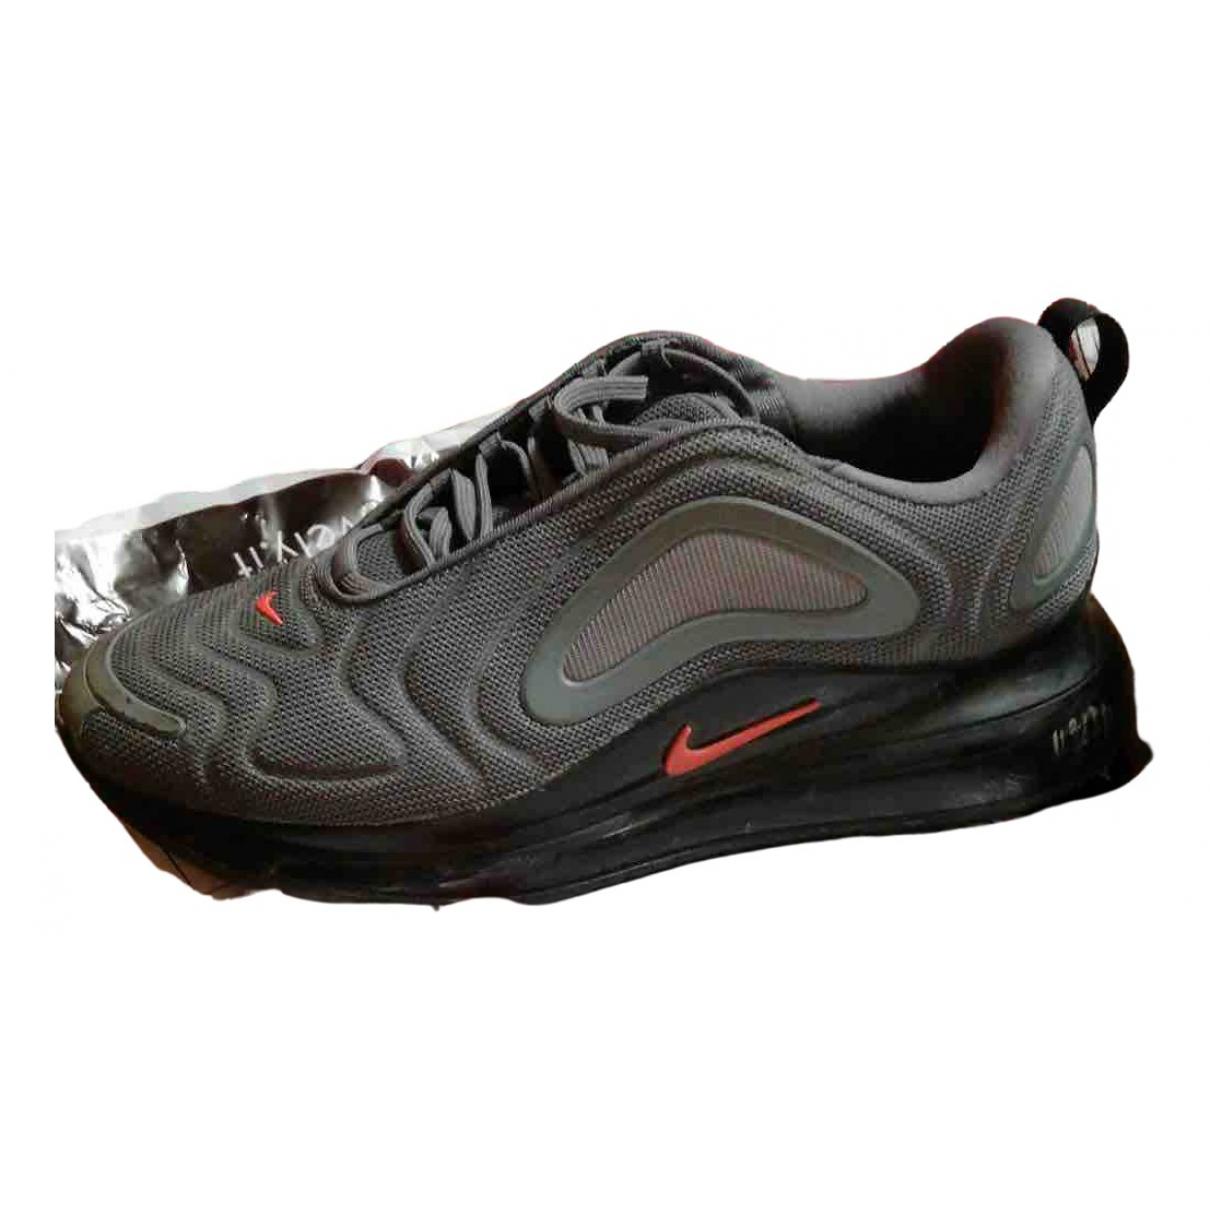 Nike Air Max 720 Sneakers in  Grau Kautschuk